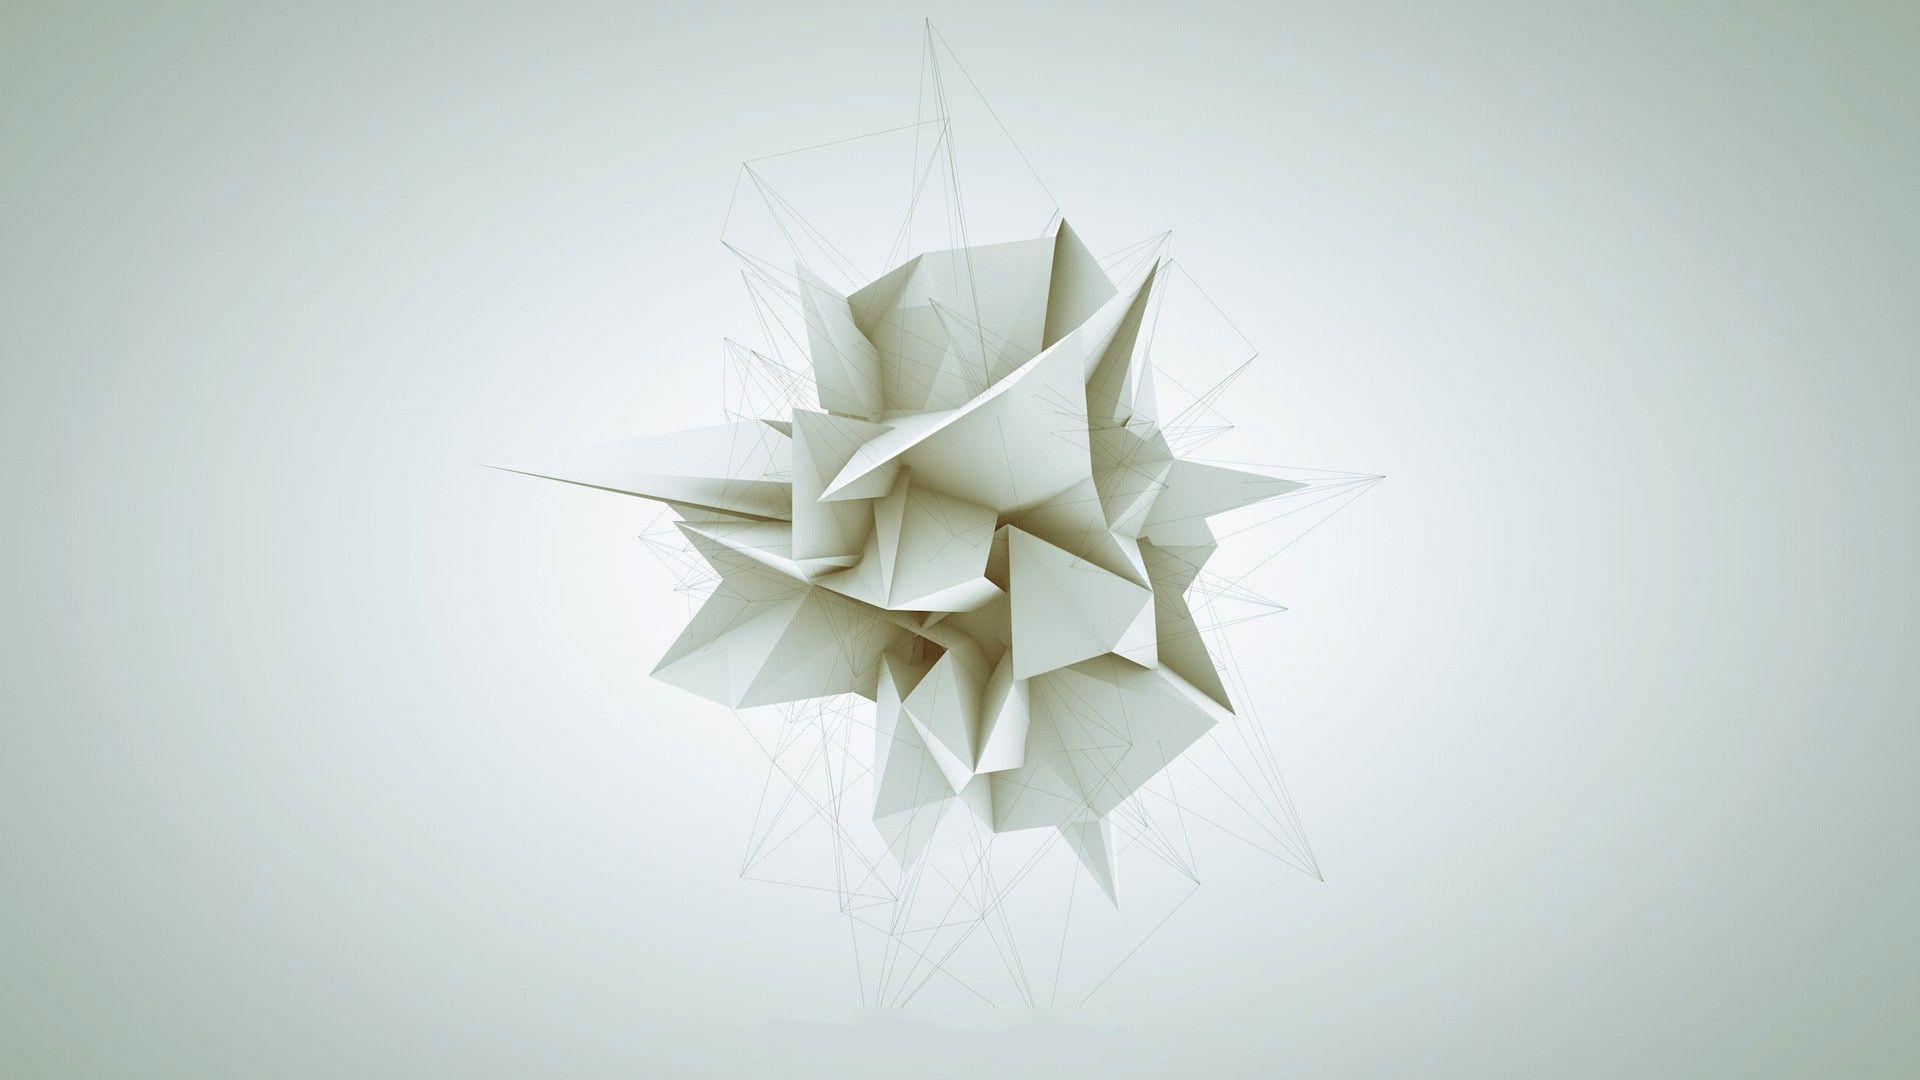 Wonderful Wallpaper Macbook Geometric - 6fe9a4594d2d0719049bd7b43f1487fa  Gallery_25771.jpg